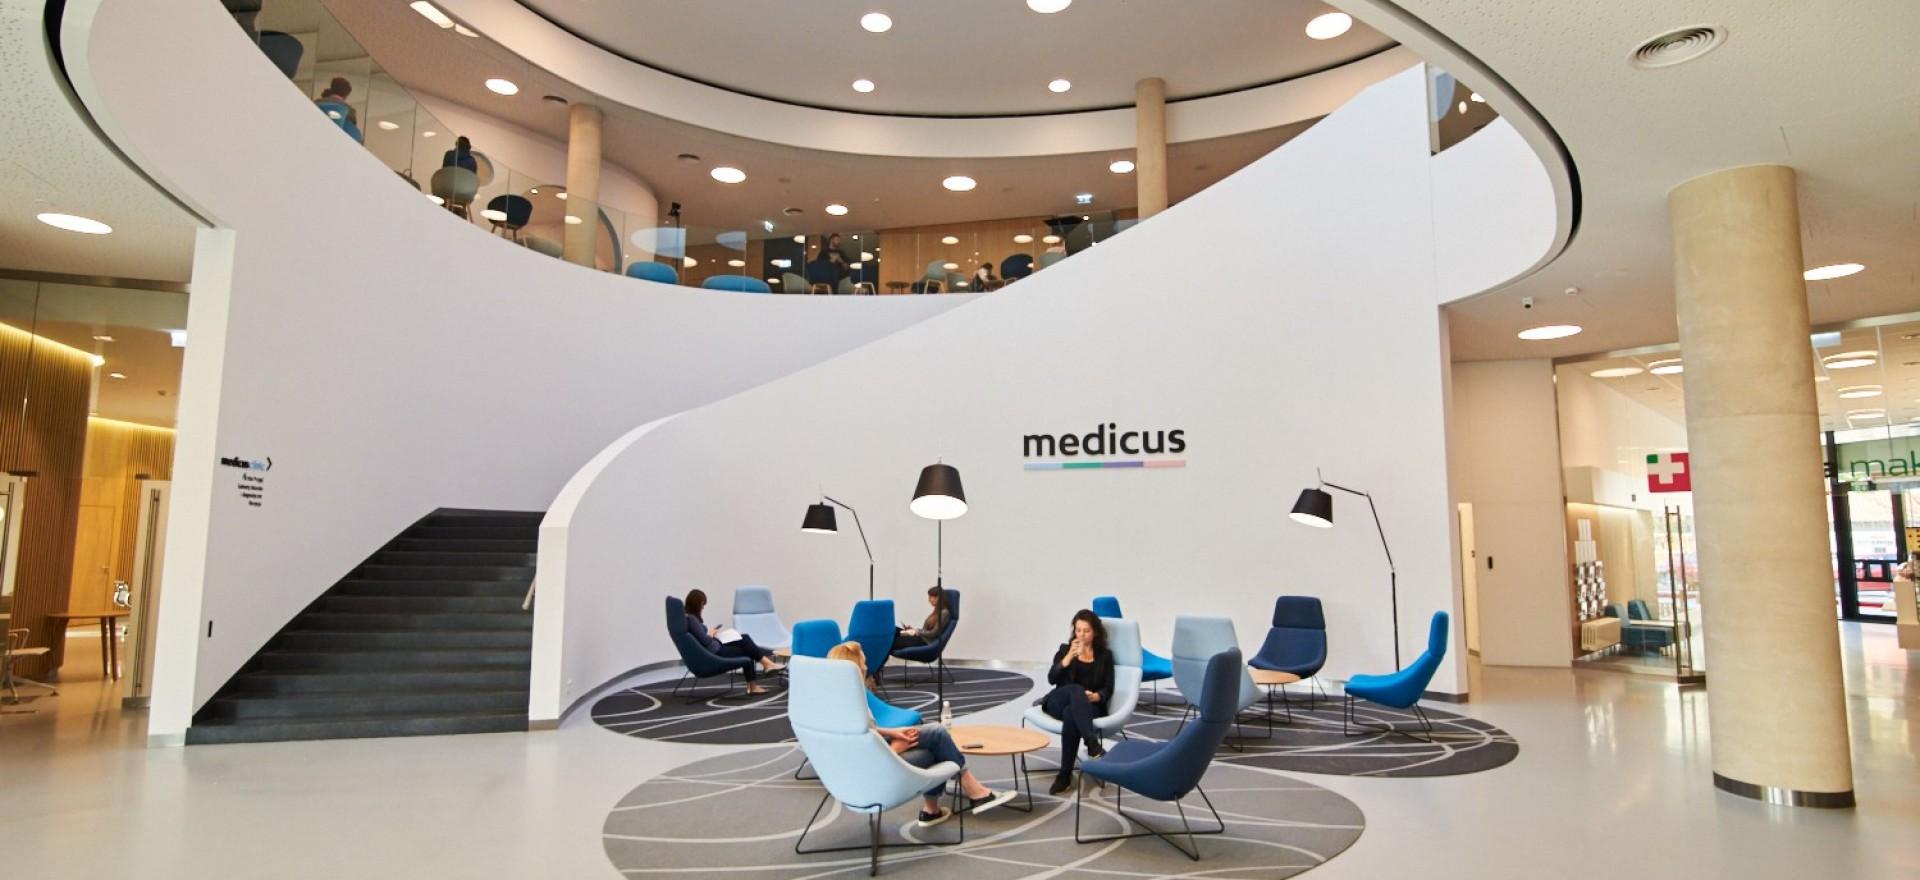 Medicus_Wroclaw 4